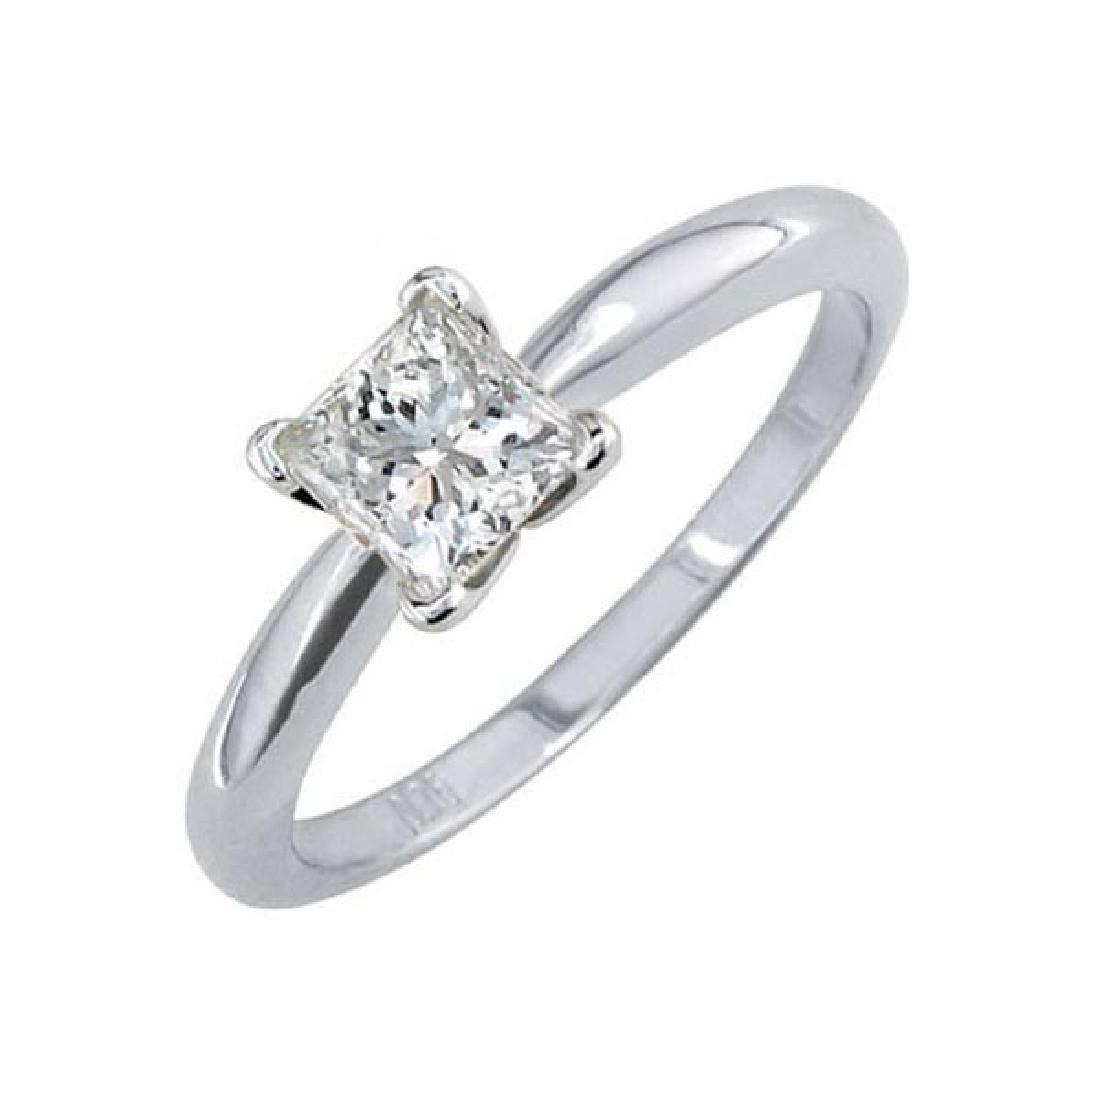 Certified 0.51 CTW Princess Diamond Solitaire 14k Ring